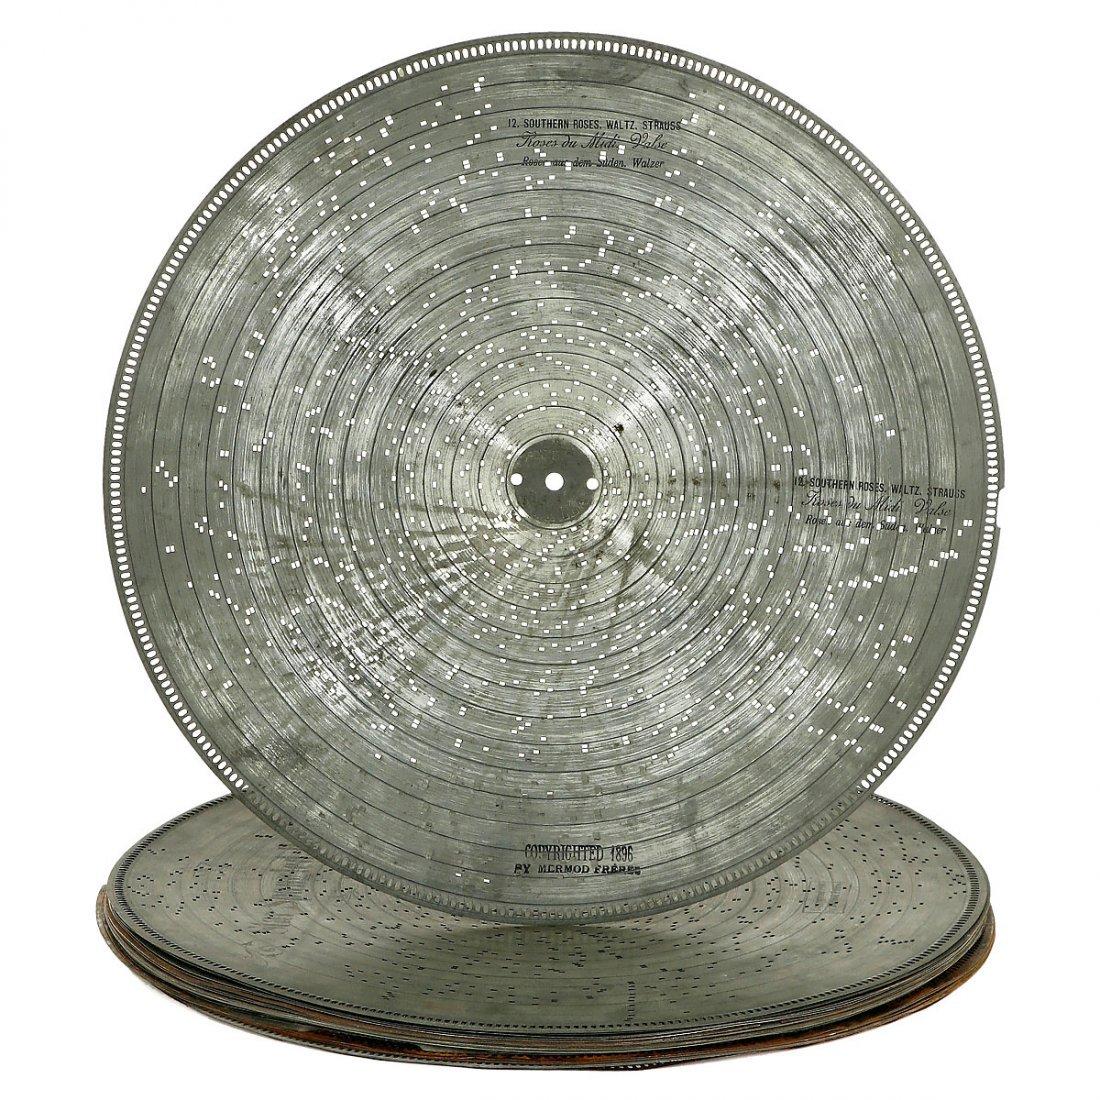 30 Stella Discs Ø 17 ¼ inch, c. 1900